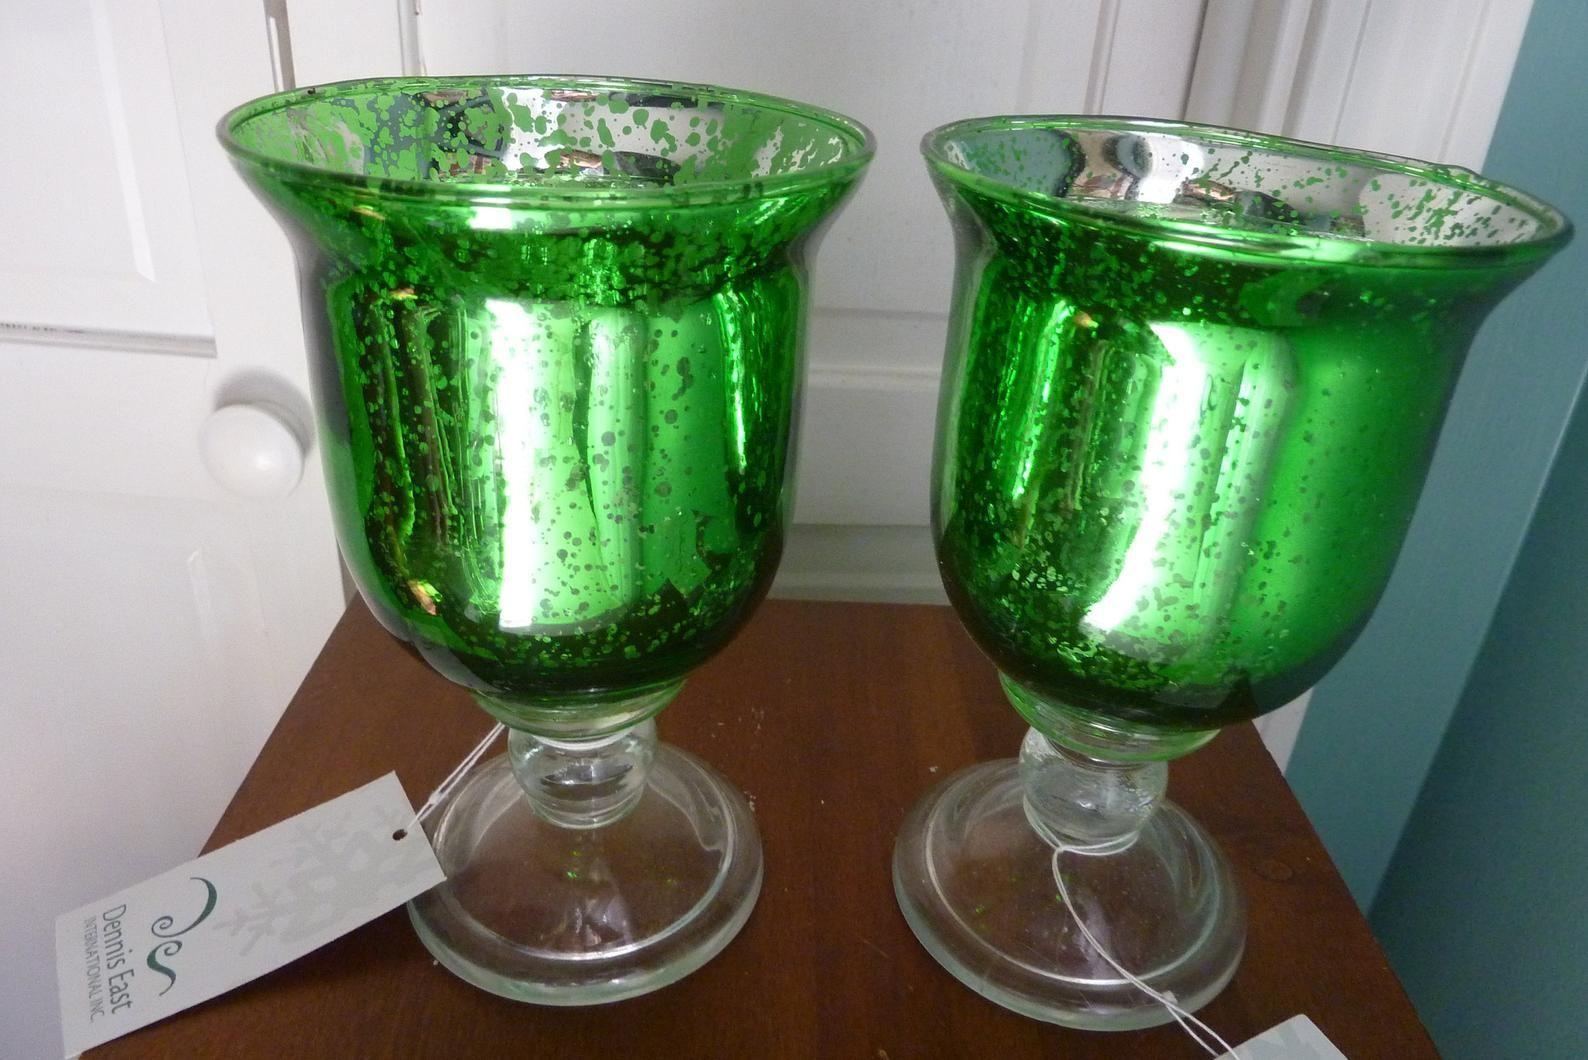 Set Of 2 Green Mercury Glass Pedestal Goblet Style Candle Etsy Mercury Glass Candle Holders Mercury Glass Glass